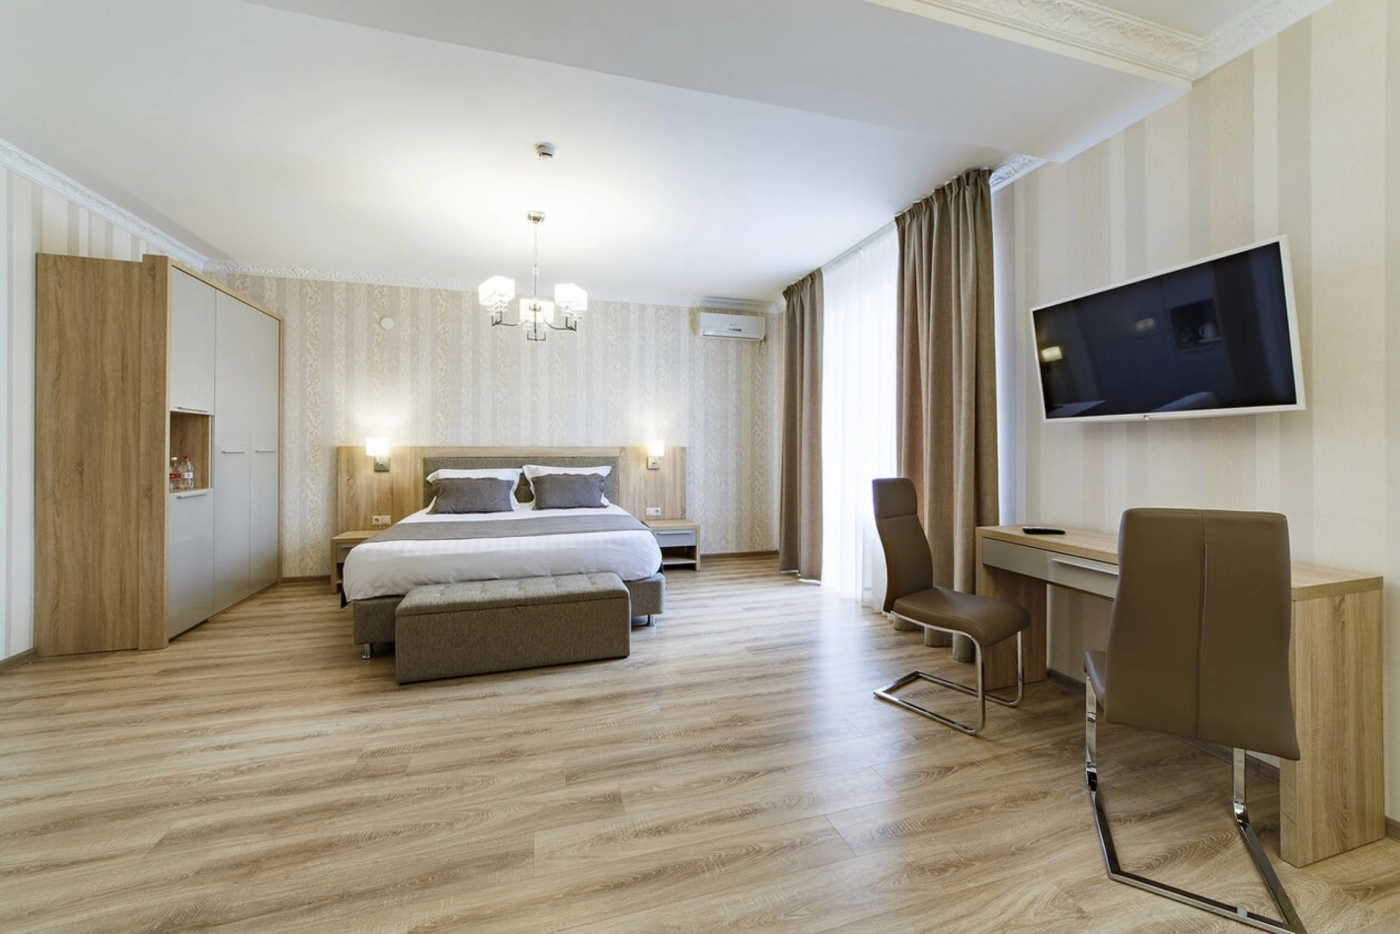 Отель «Alean Family Hotel Usadba 4*» Краснодарский край Стандарт 2-местный, фото 1